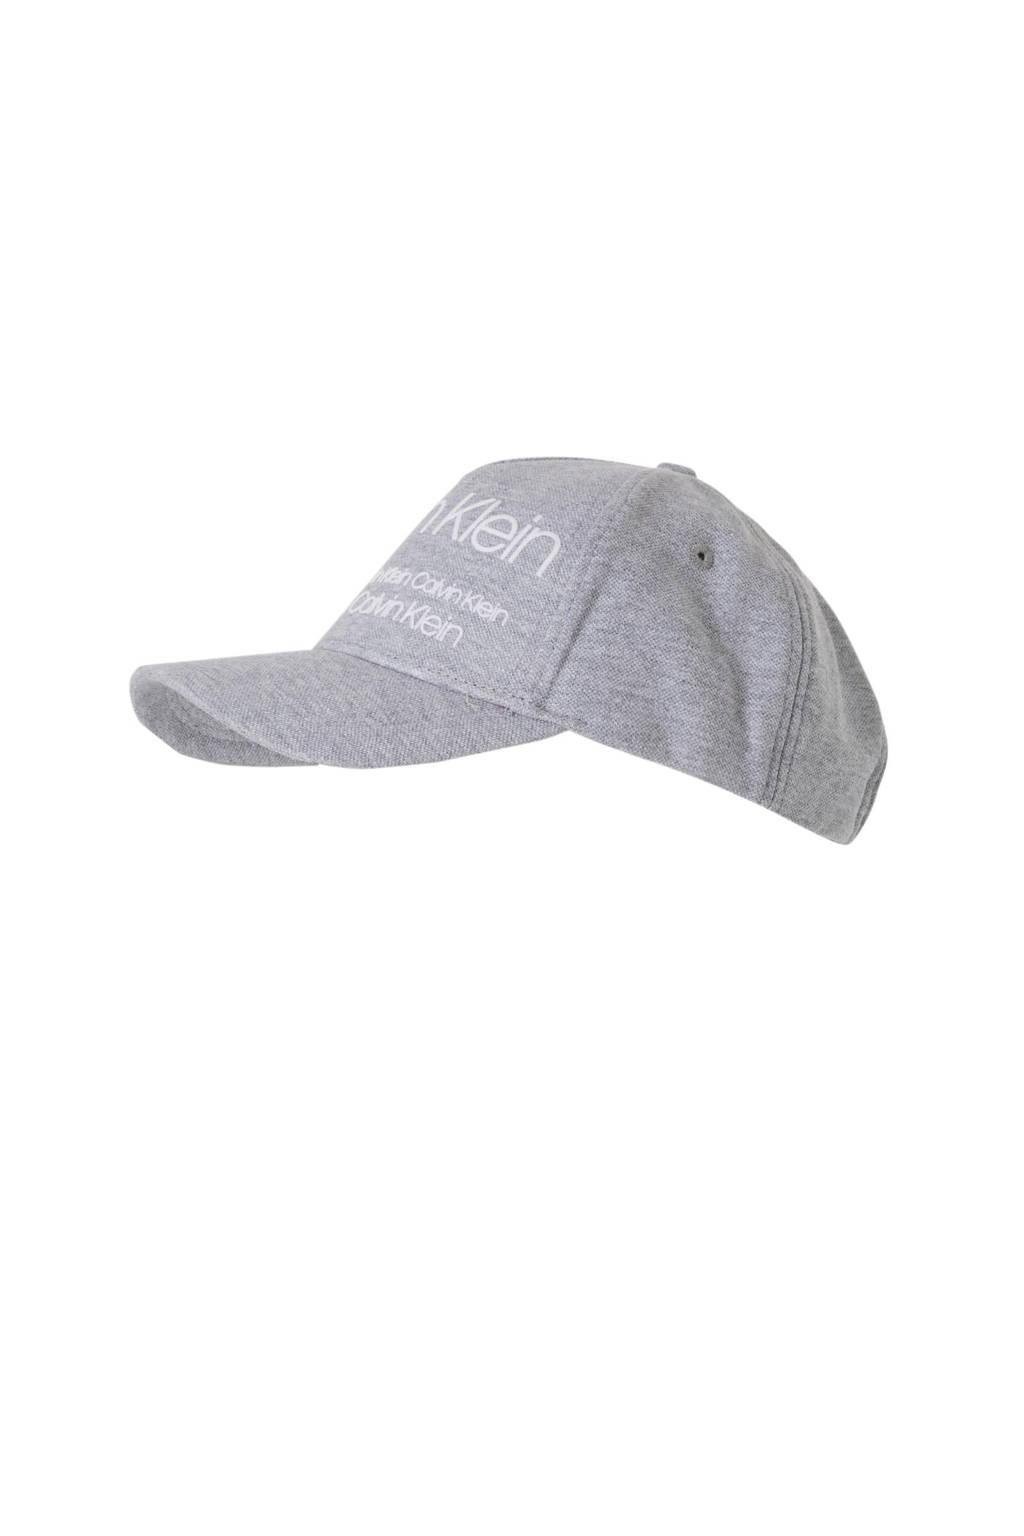 Calvin Klein pet INDUSTRIAL PIQUE' BASEBALL CAP, Grijs melange